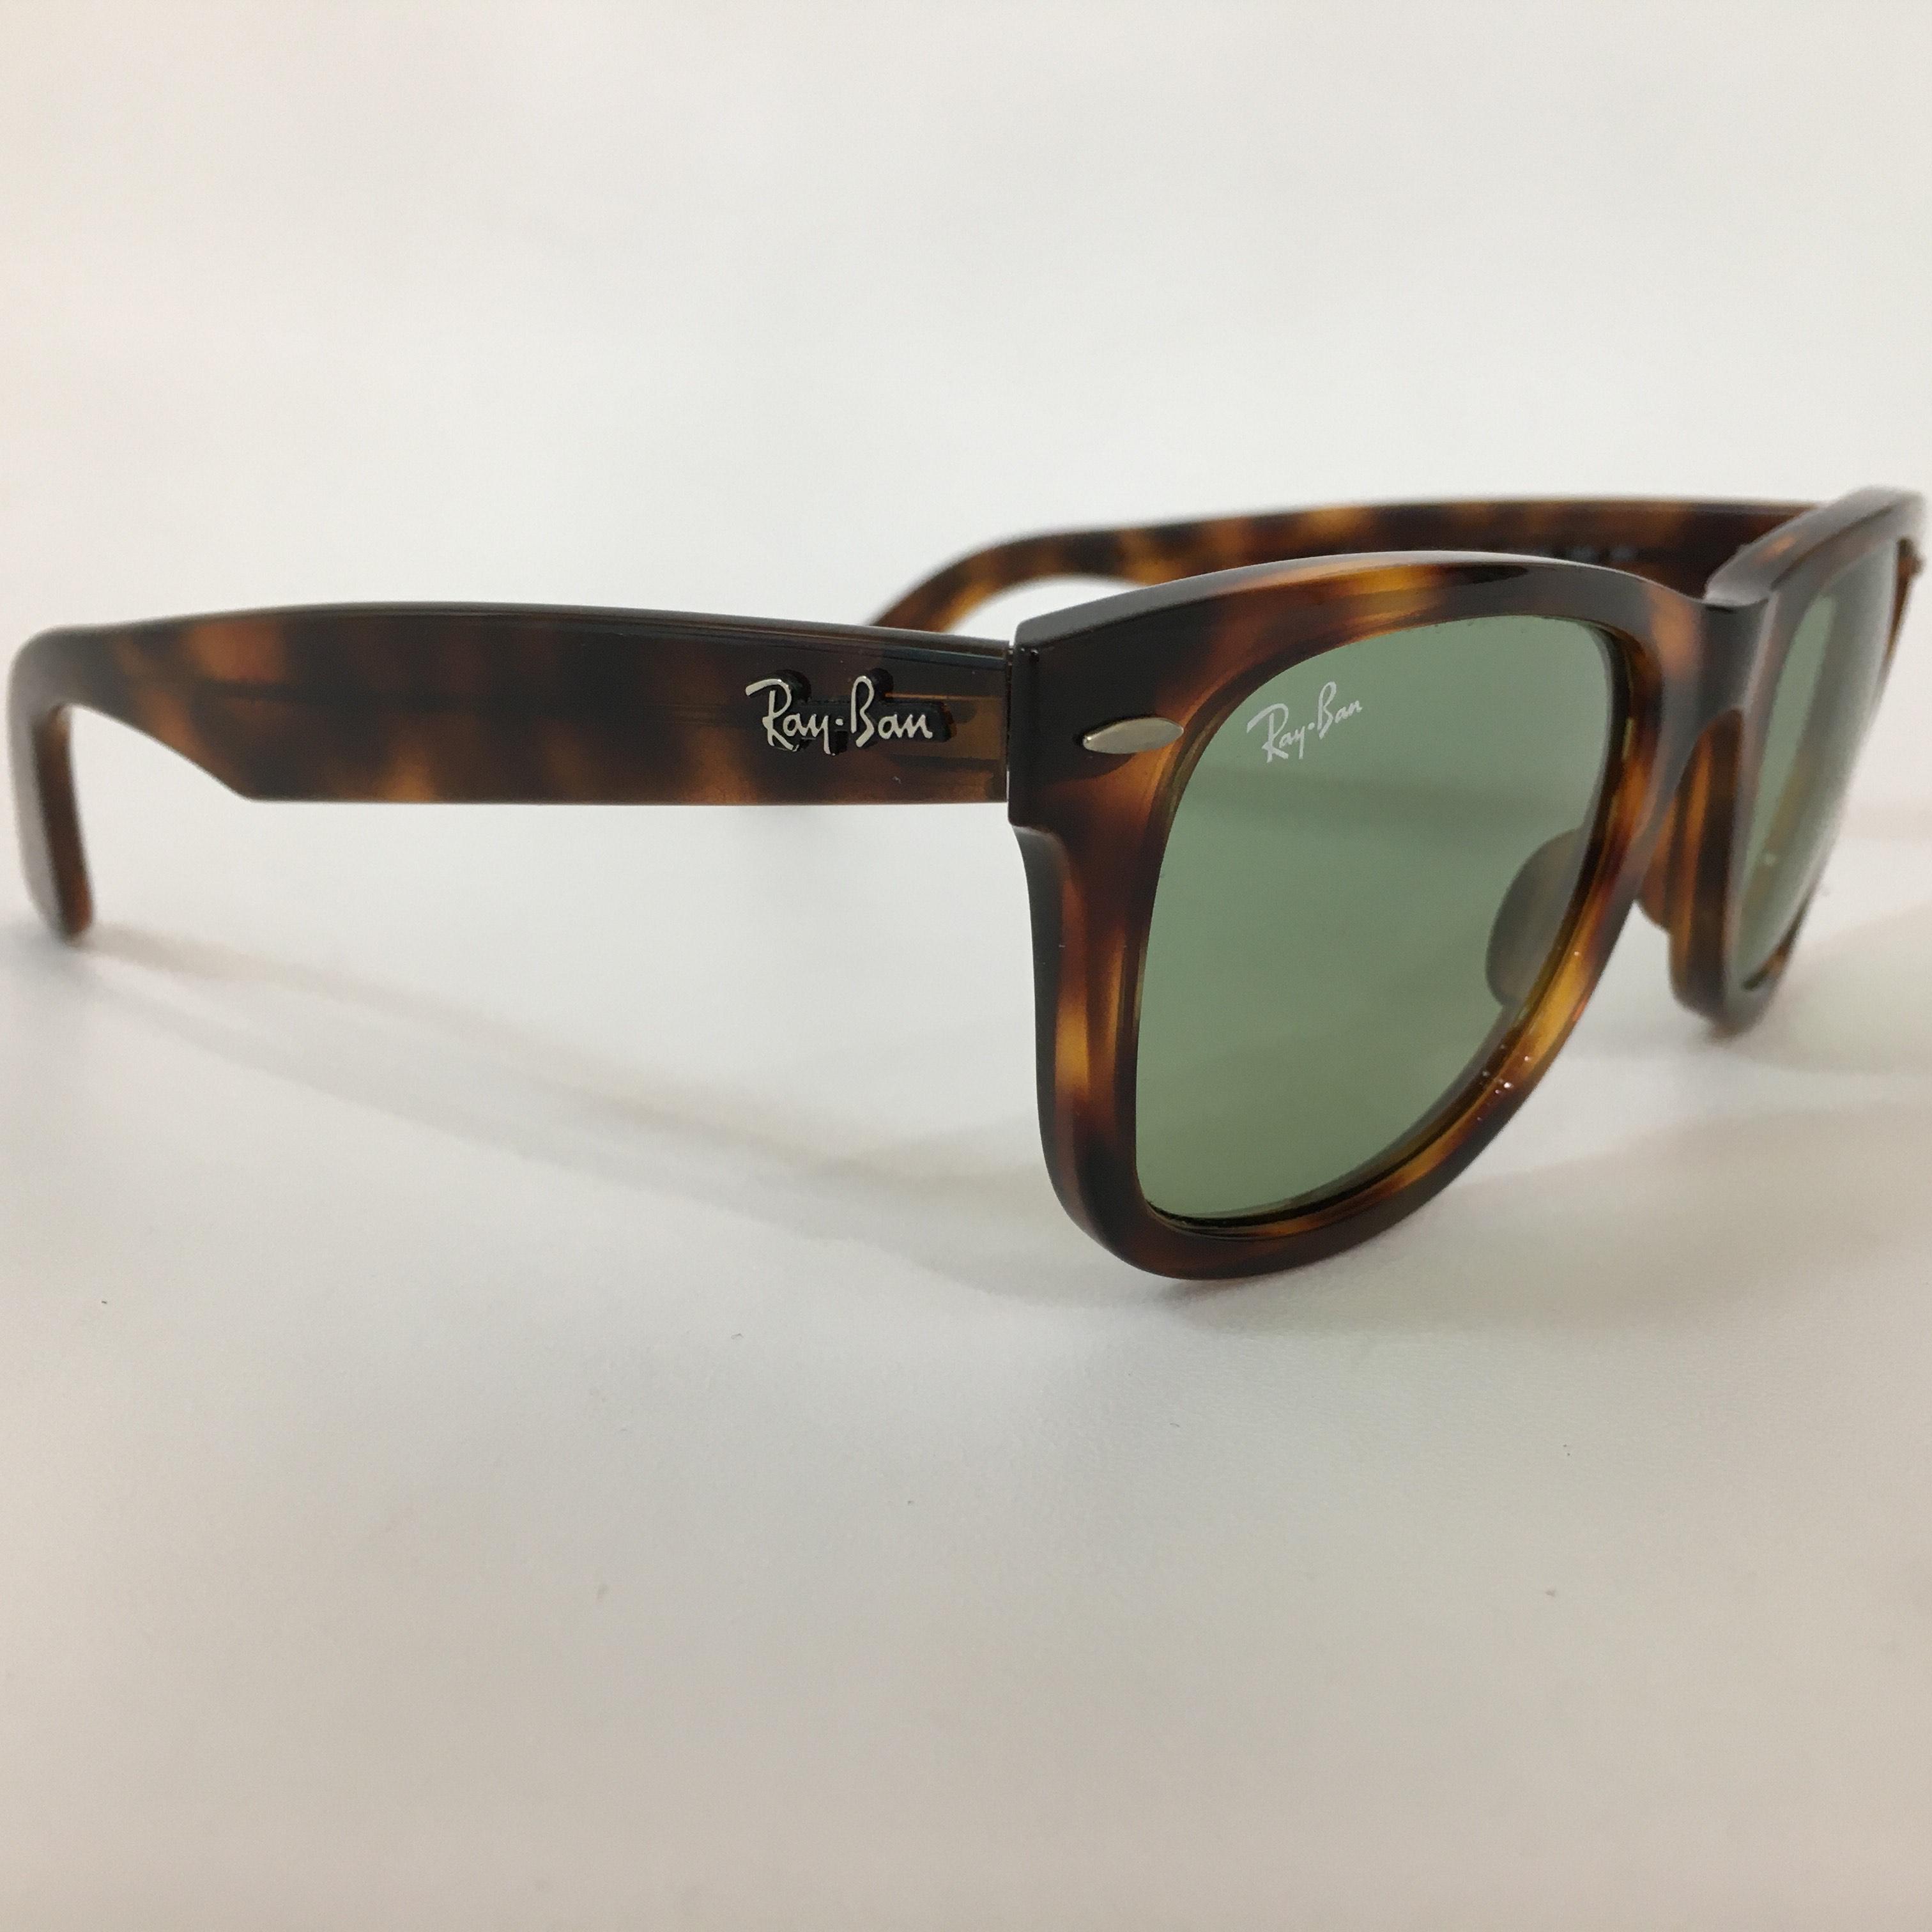 Sunglasses Ray-Ban RB 4340 6397/4M